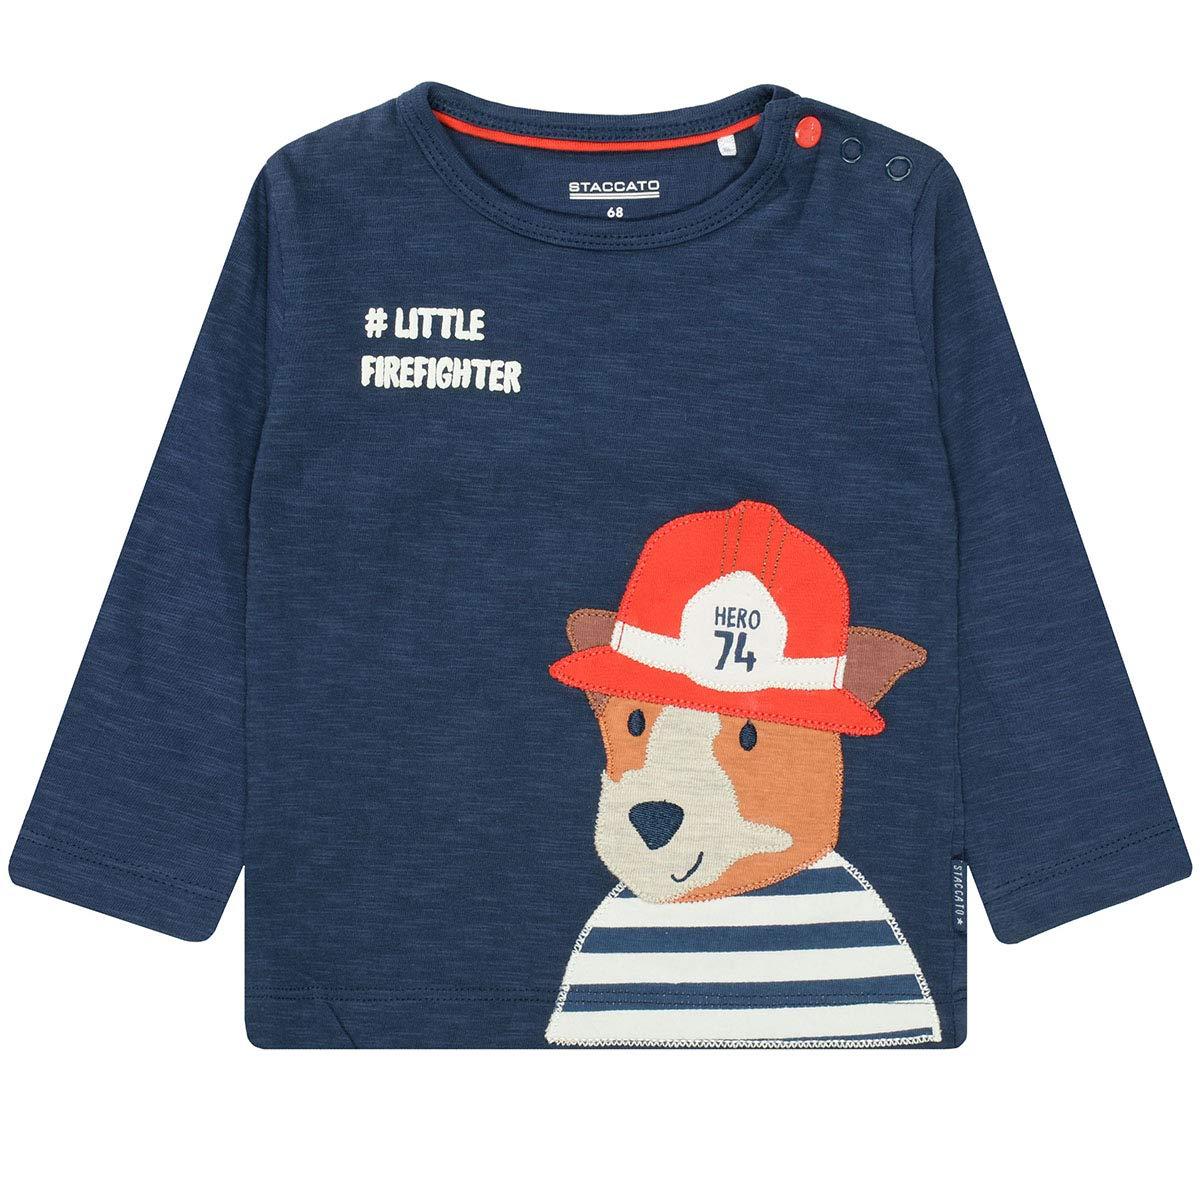 230070400 Staccato Jungen Shirt Firefighter Midnight